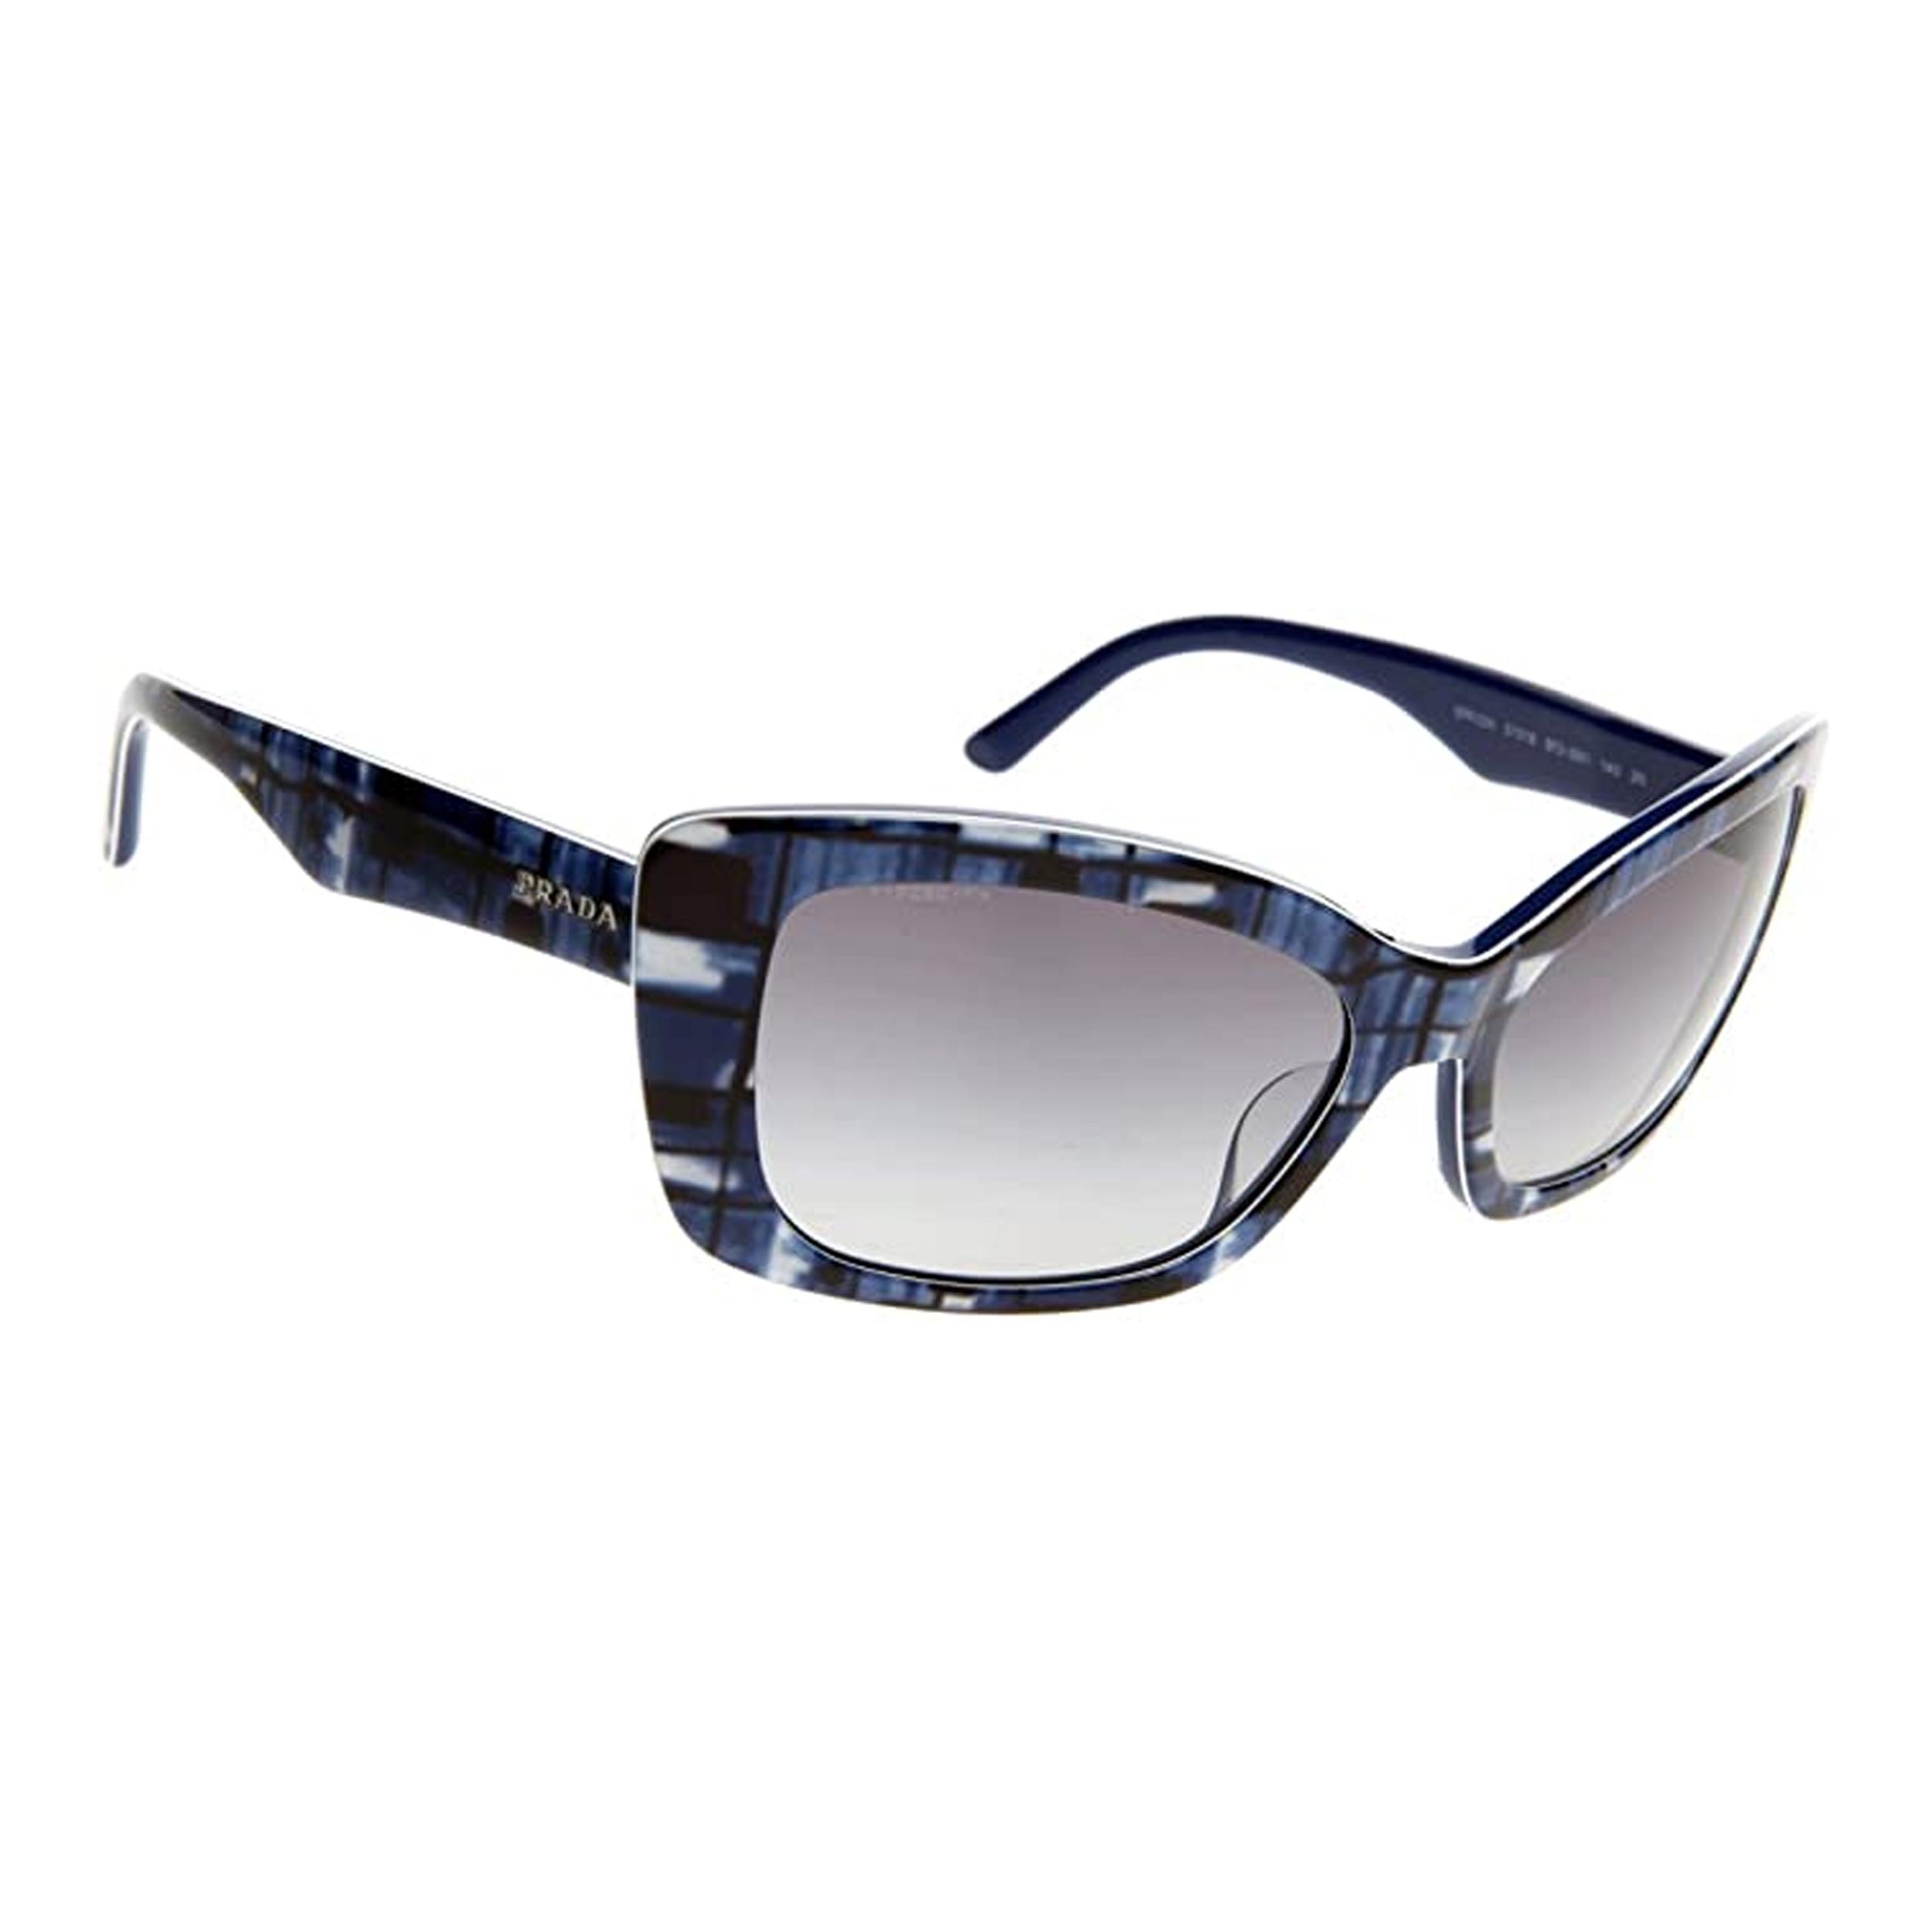 عینک آفتابی پرادا مدل PR 03NS BF23M1